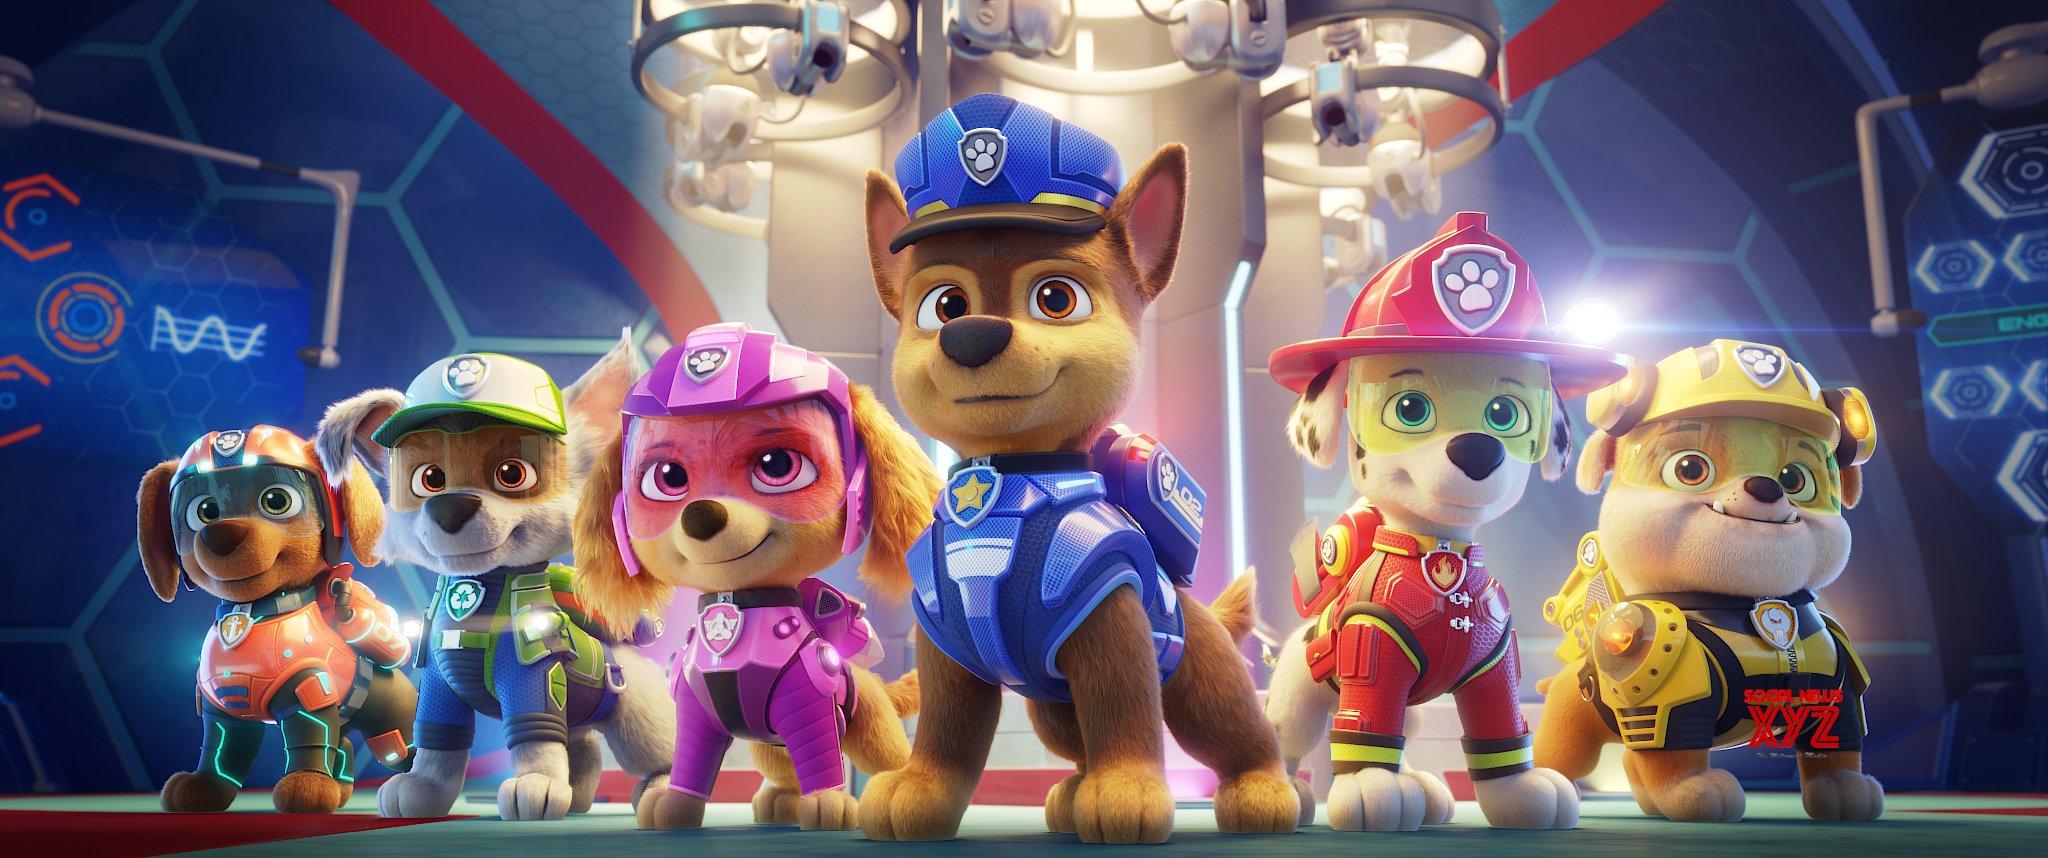 Paw Patrol The Movie HD Stills